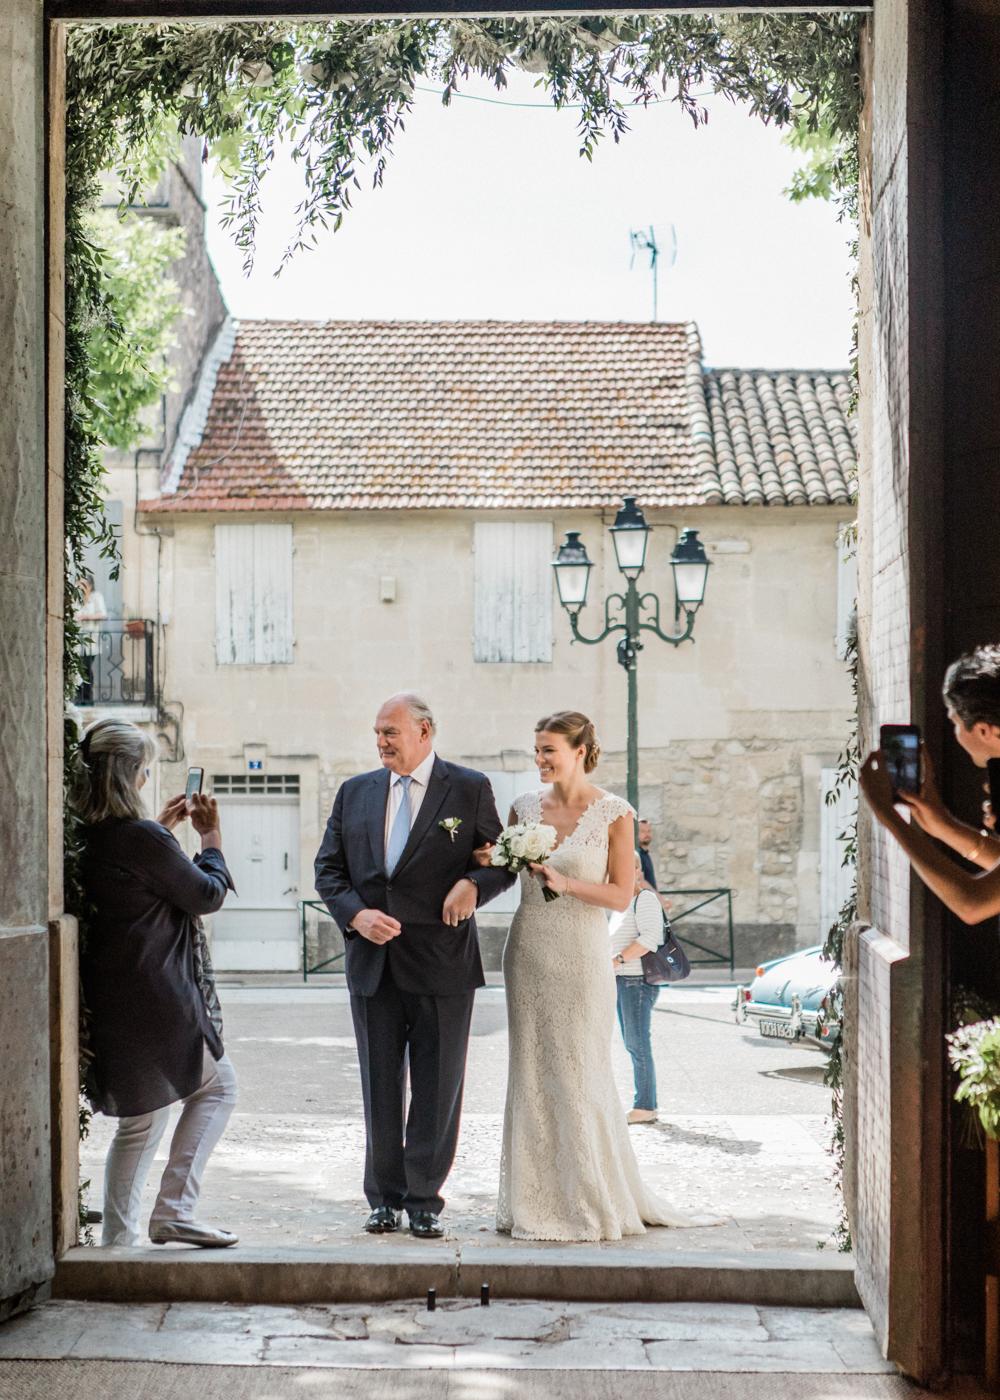 Provence_Wedding_(c)_Rory_Wylie-75.jpg